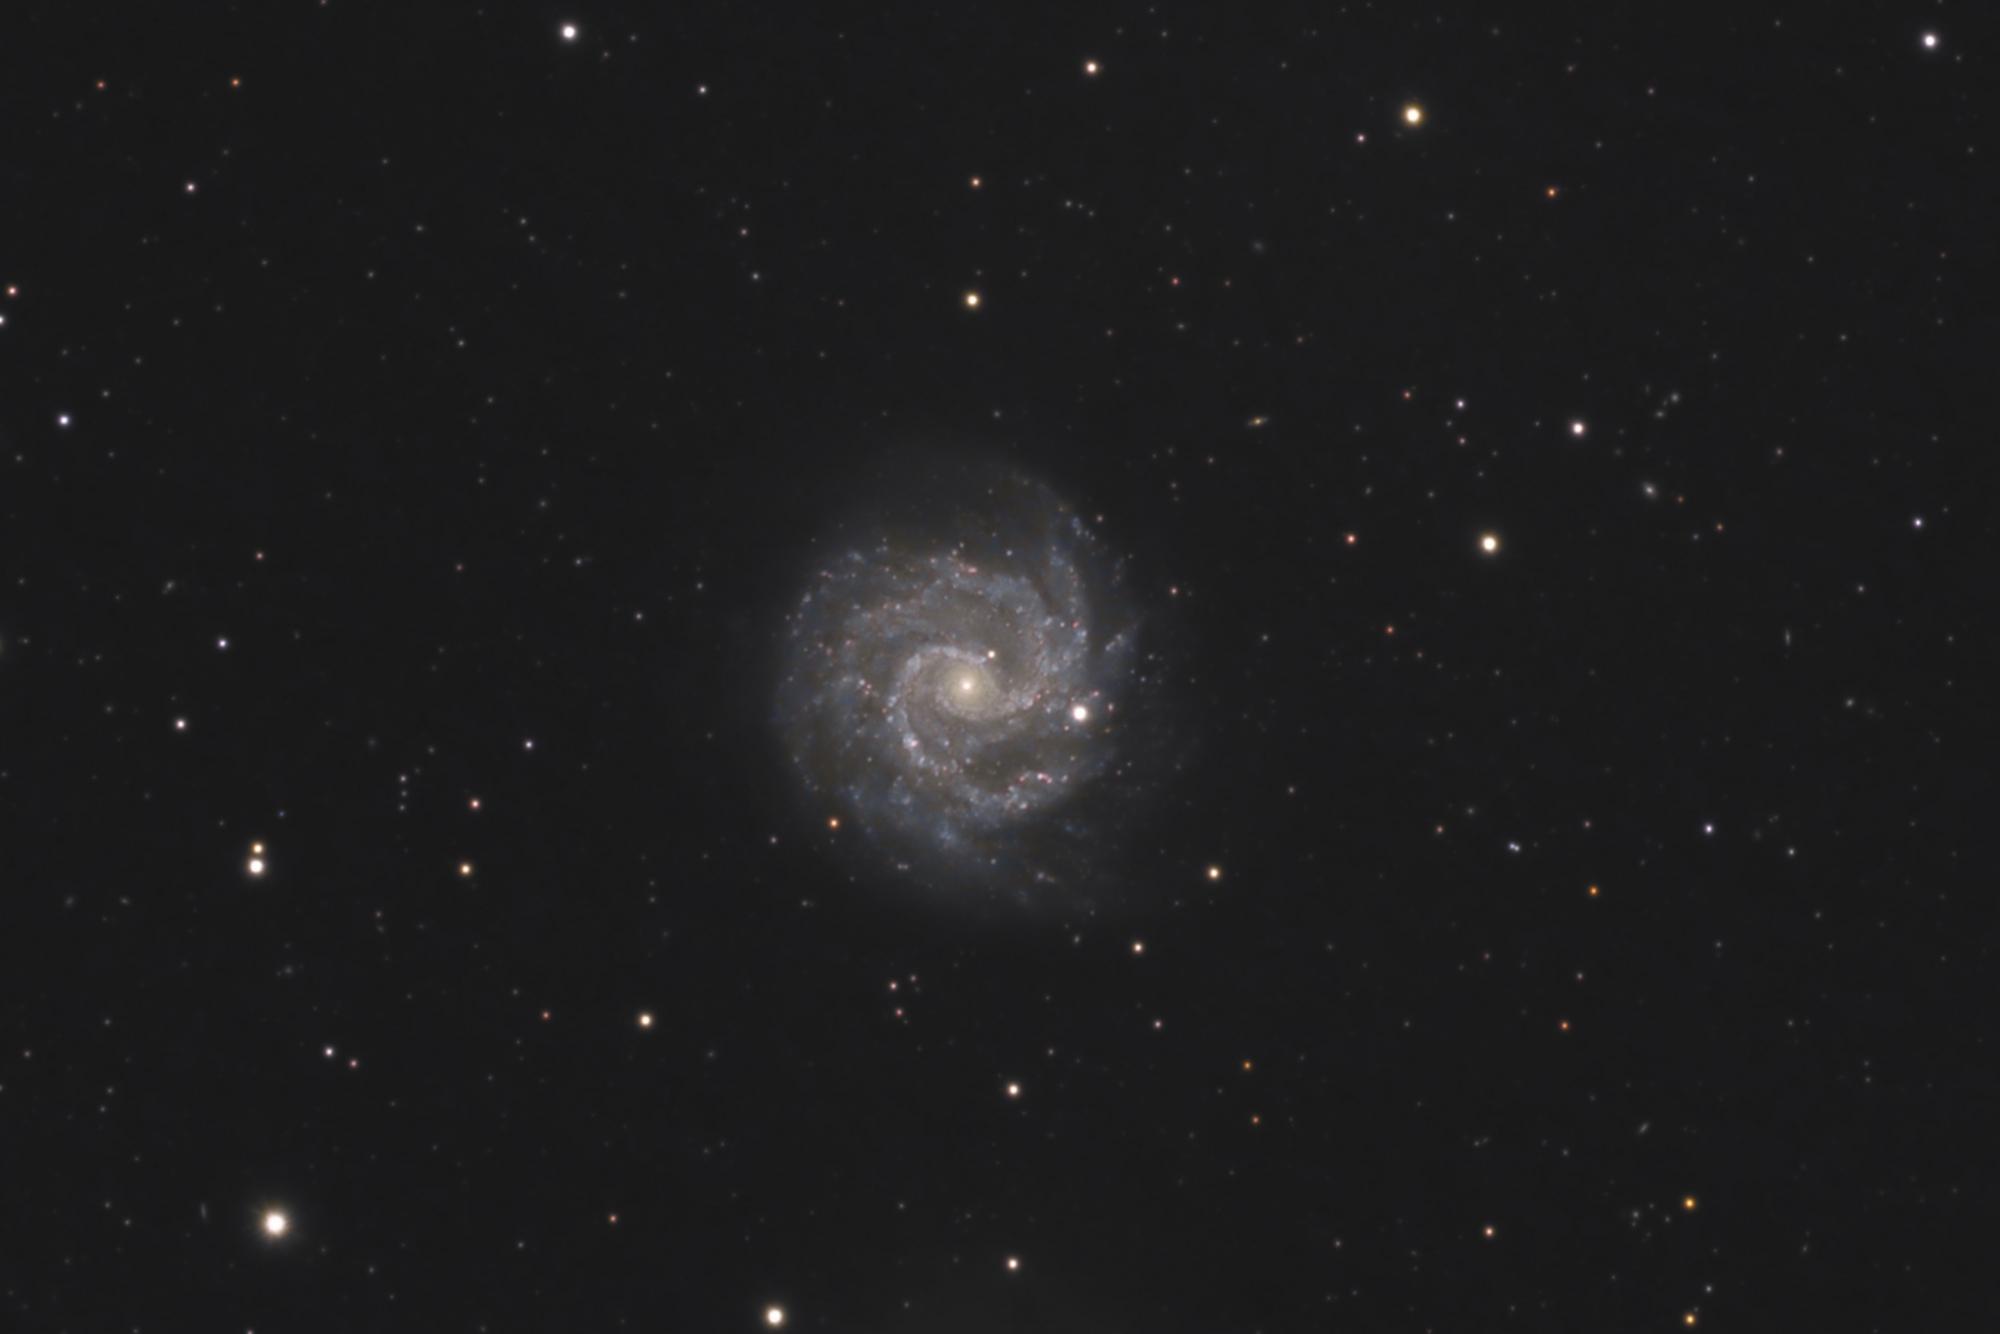 60300912e3650_NGC3184HaLRGB-2048-.thumb.jpg.b1ab9eef20a534174c5b09430d24e1eb.jpg